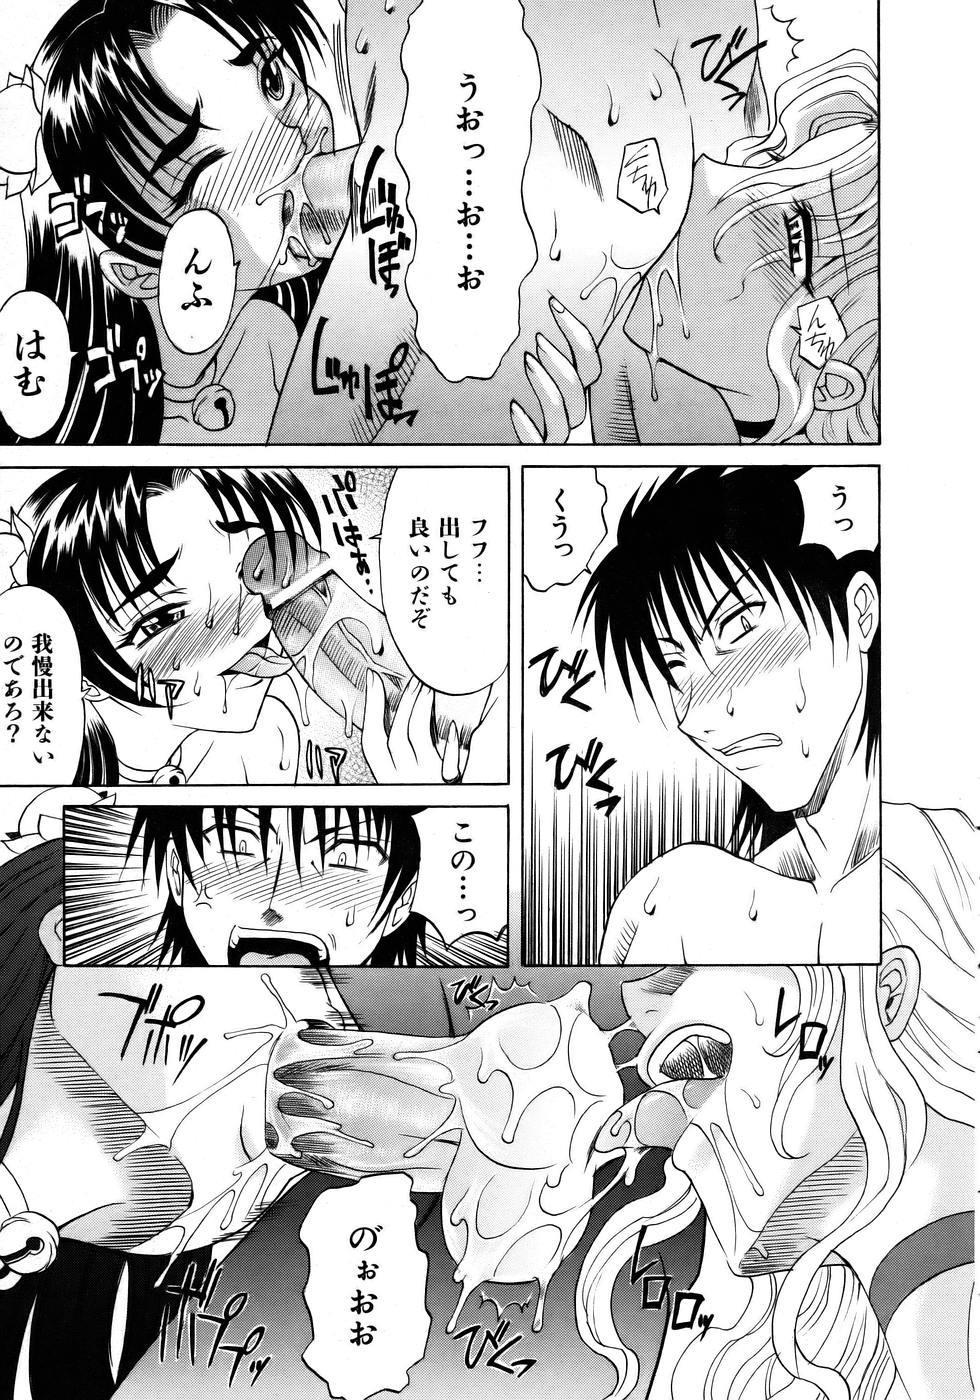 COMIC AUN 2005-12 Vol. 115 22